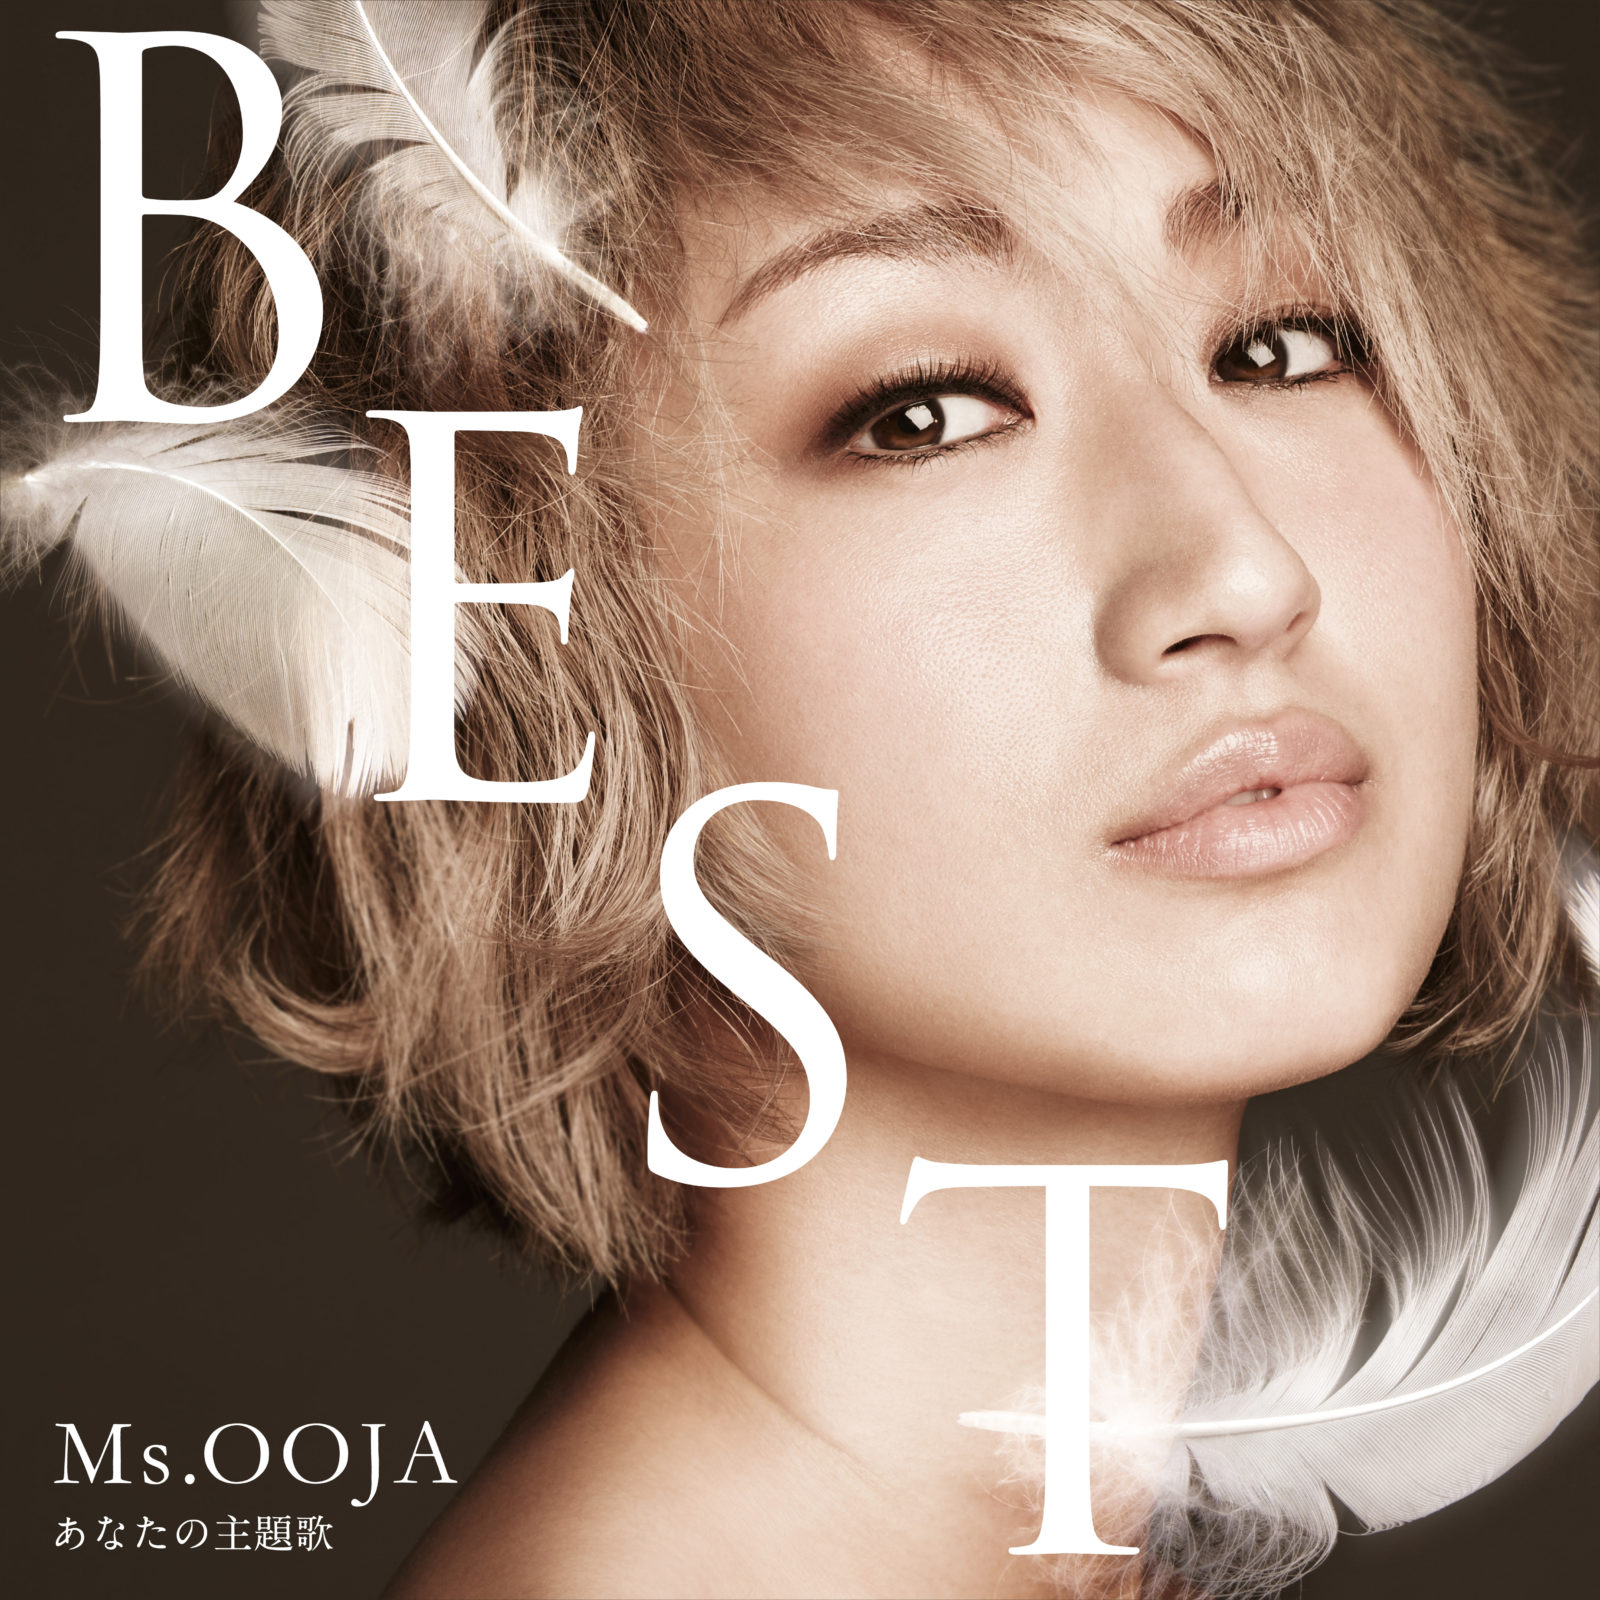 BEST ALBUM「THE BEST あなたの主題歌」ジャケット写真